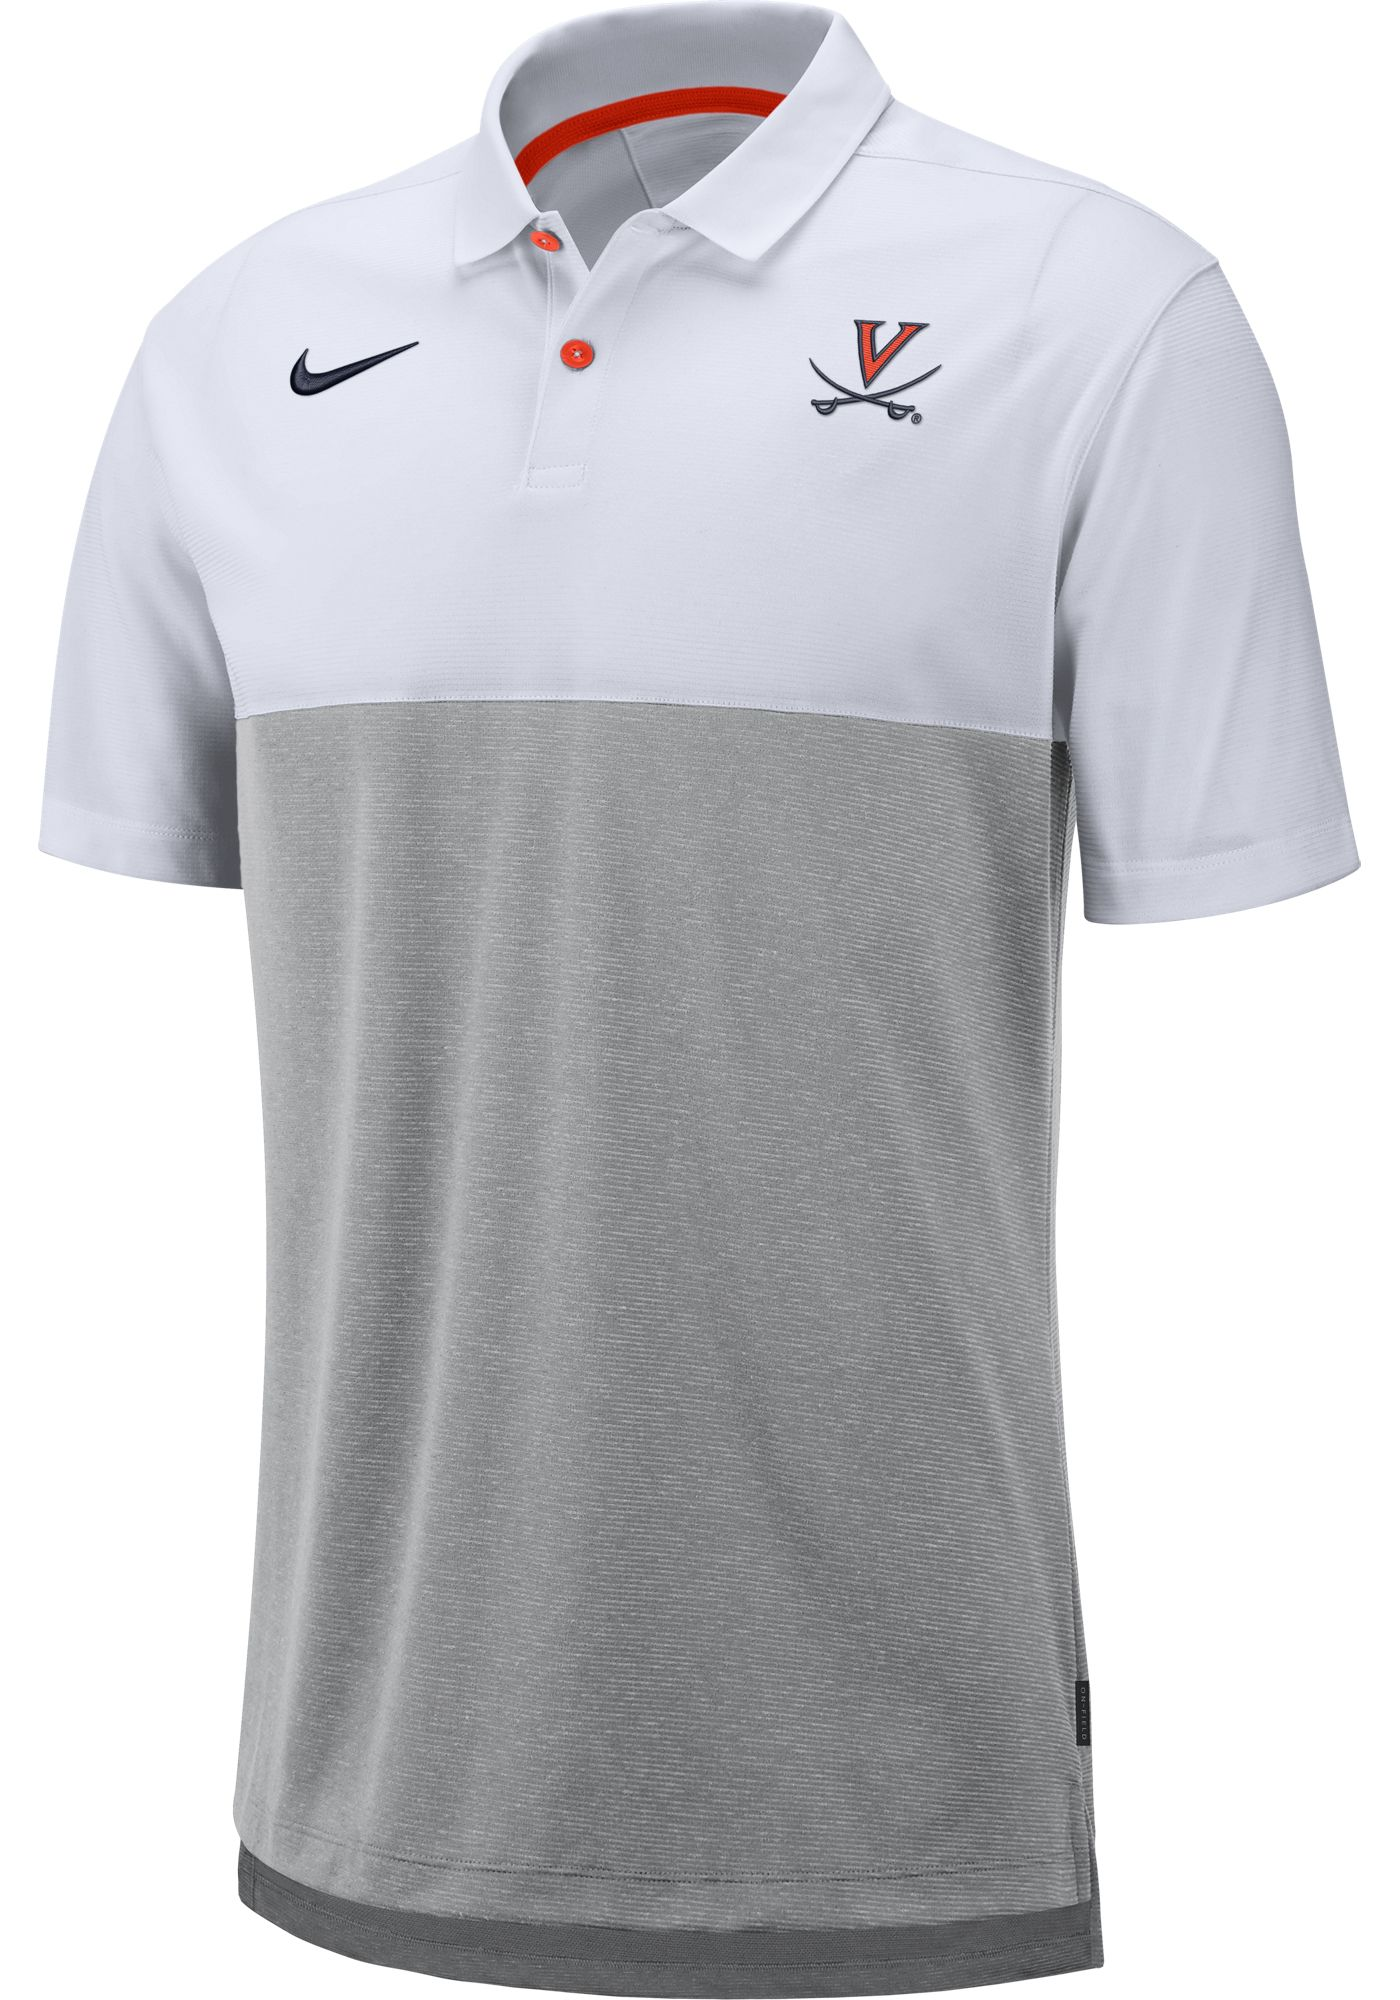 Nike Men's Virginia Cavaliers White/Grey Dri-FIT Breathe Football Sideline Polo